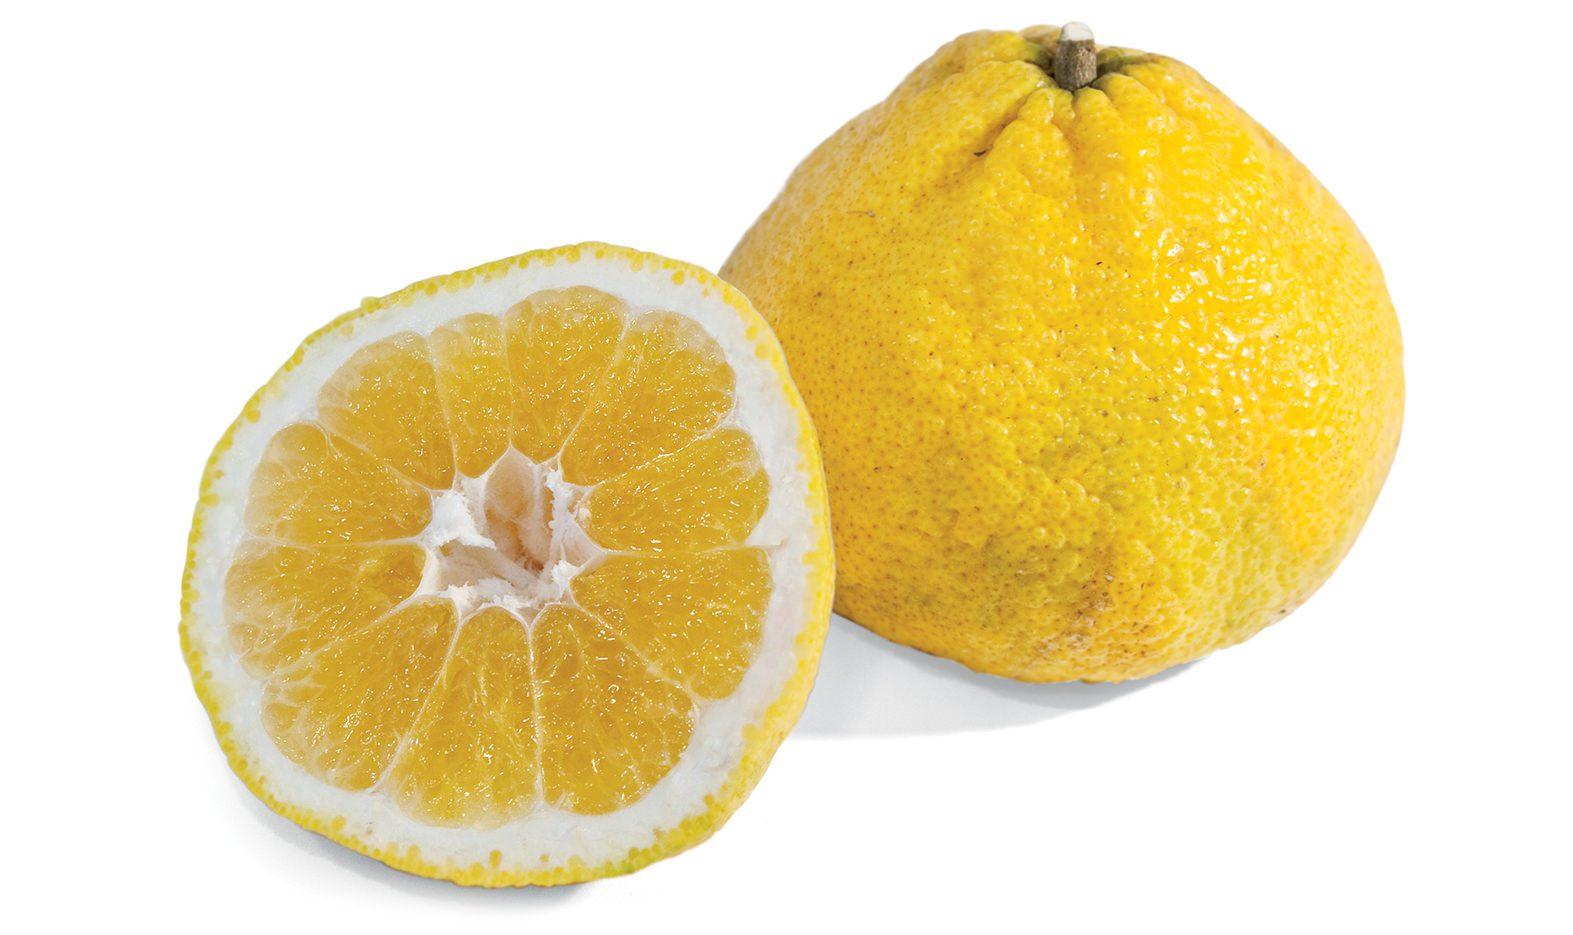 UGLI<sup>®</sup> (Uniq) Fruit Image